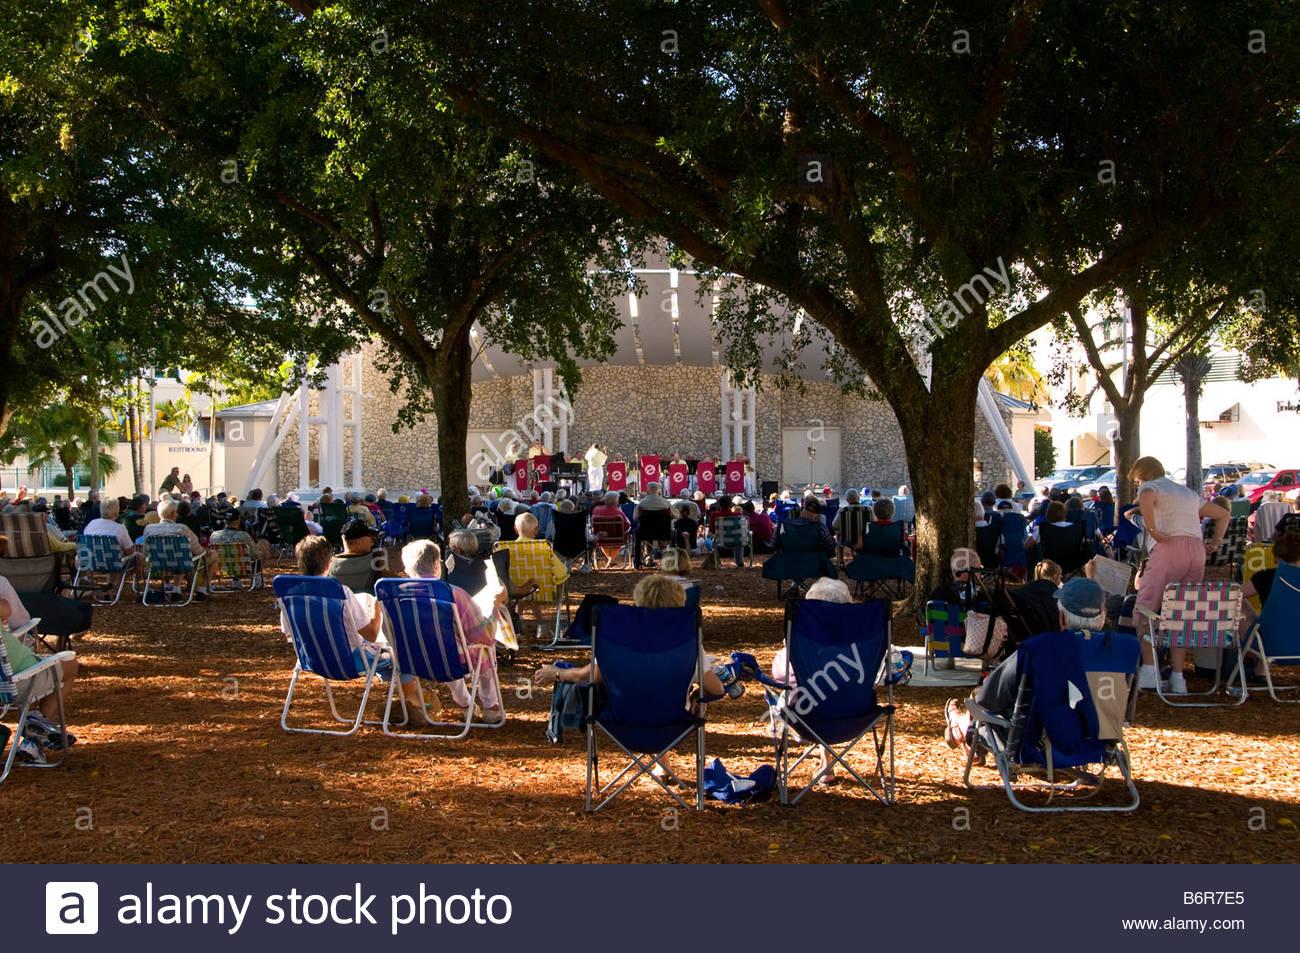 Outdoor Concert Stock Photos & Outdoor Concert Stock With Naples Fl Outdoor Concerts